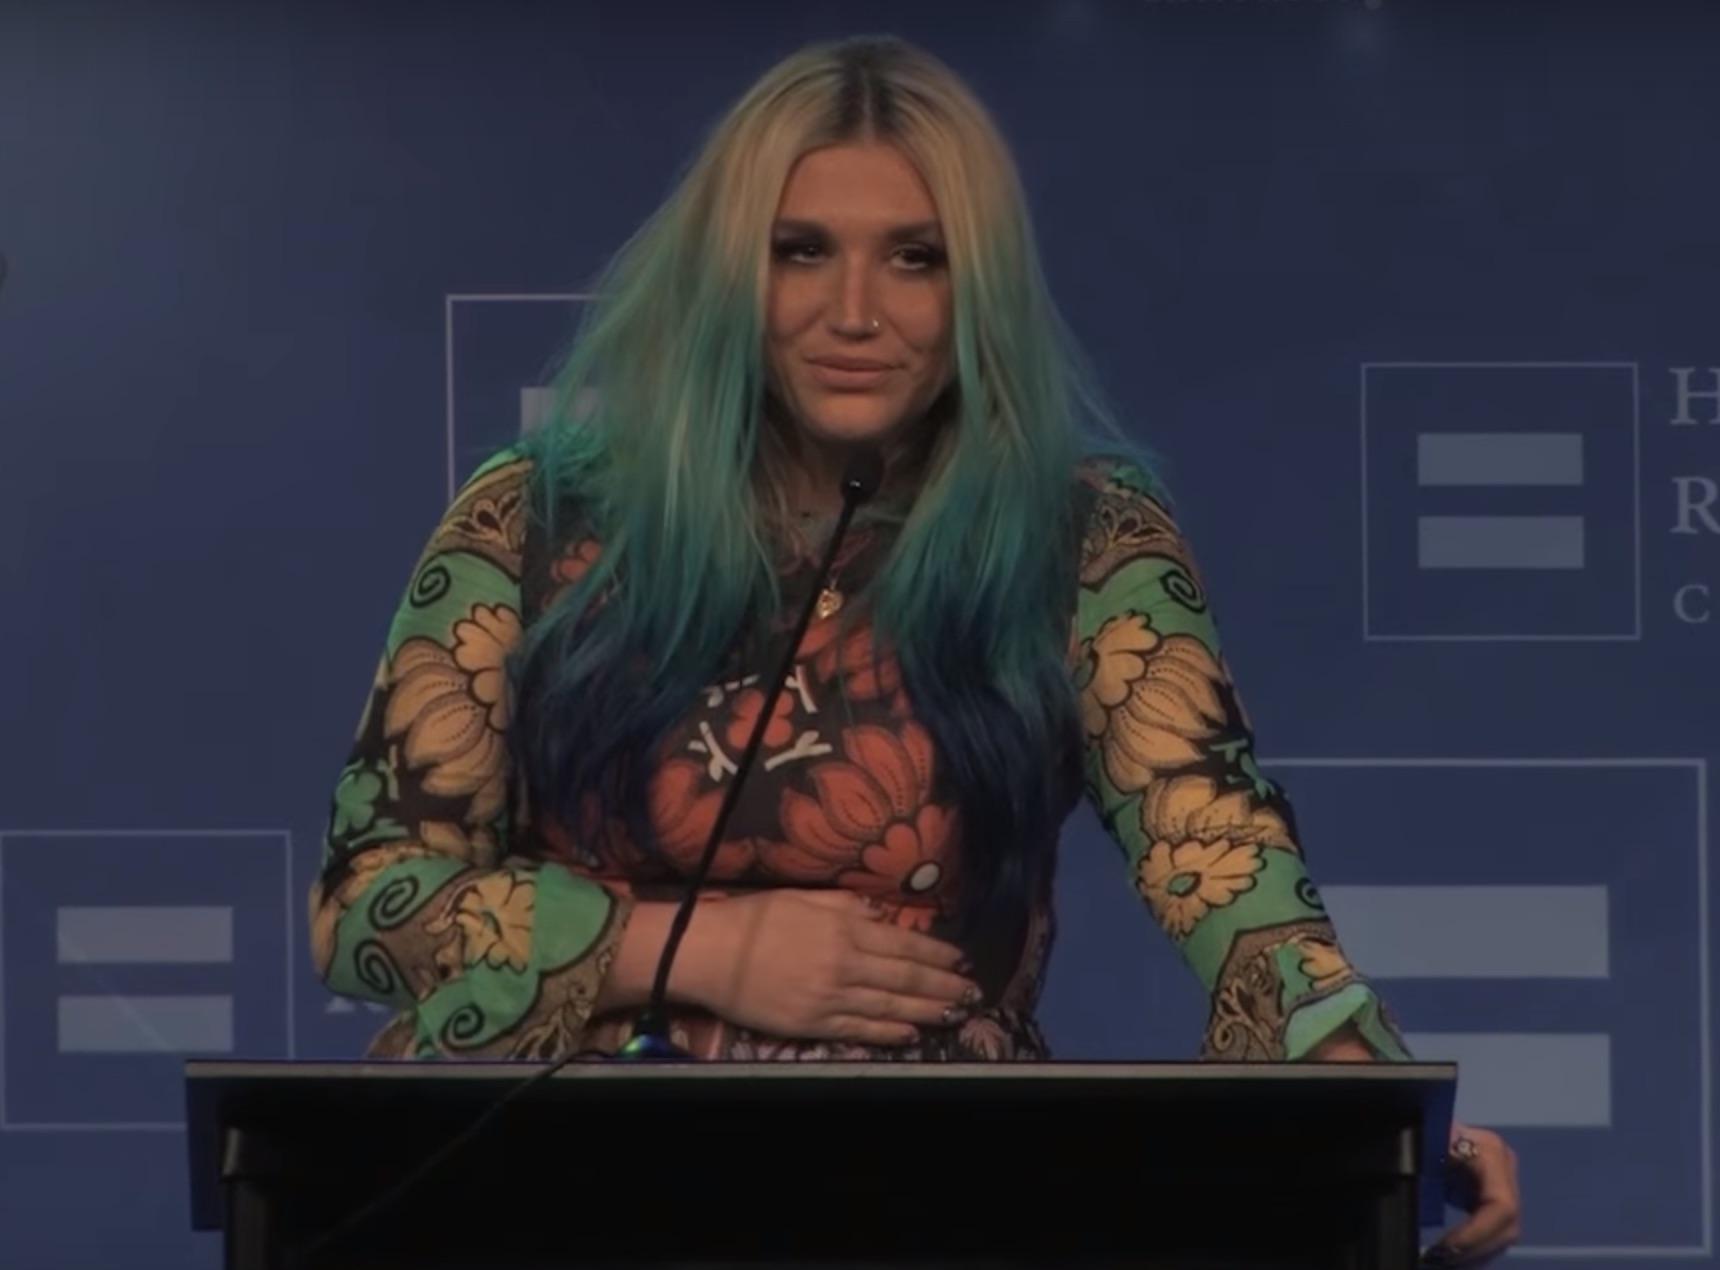 Kesha Human Rights Award